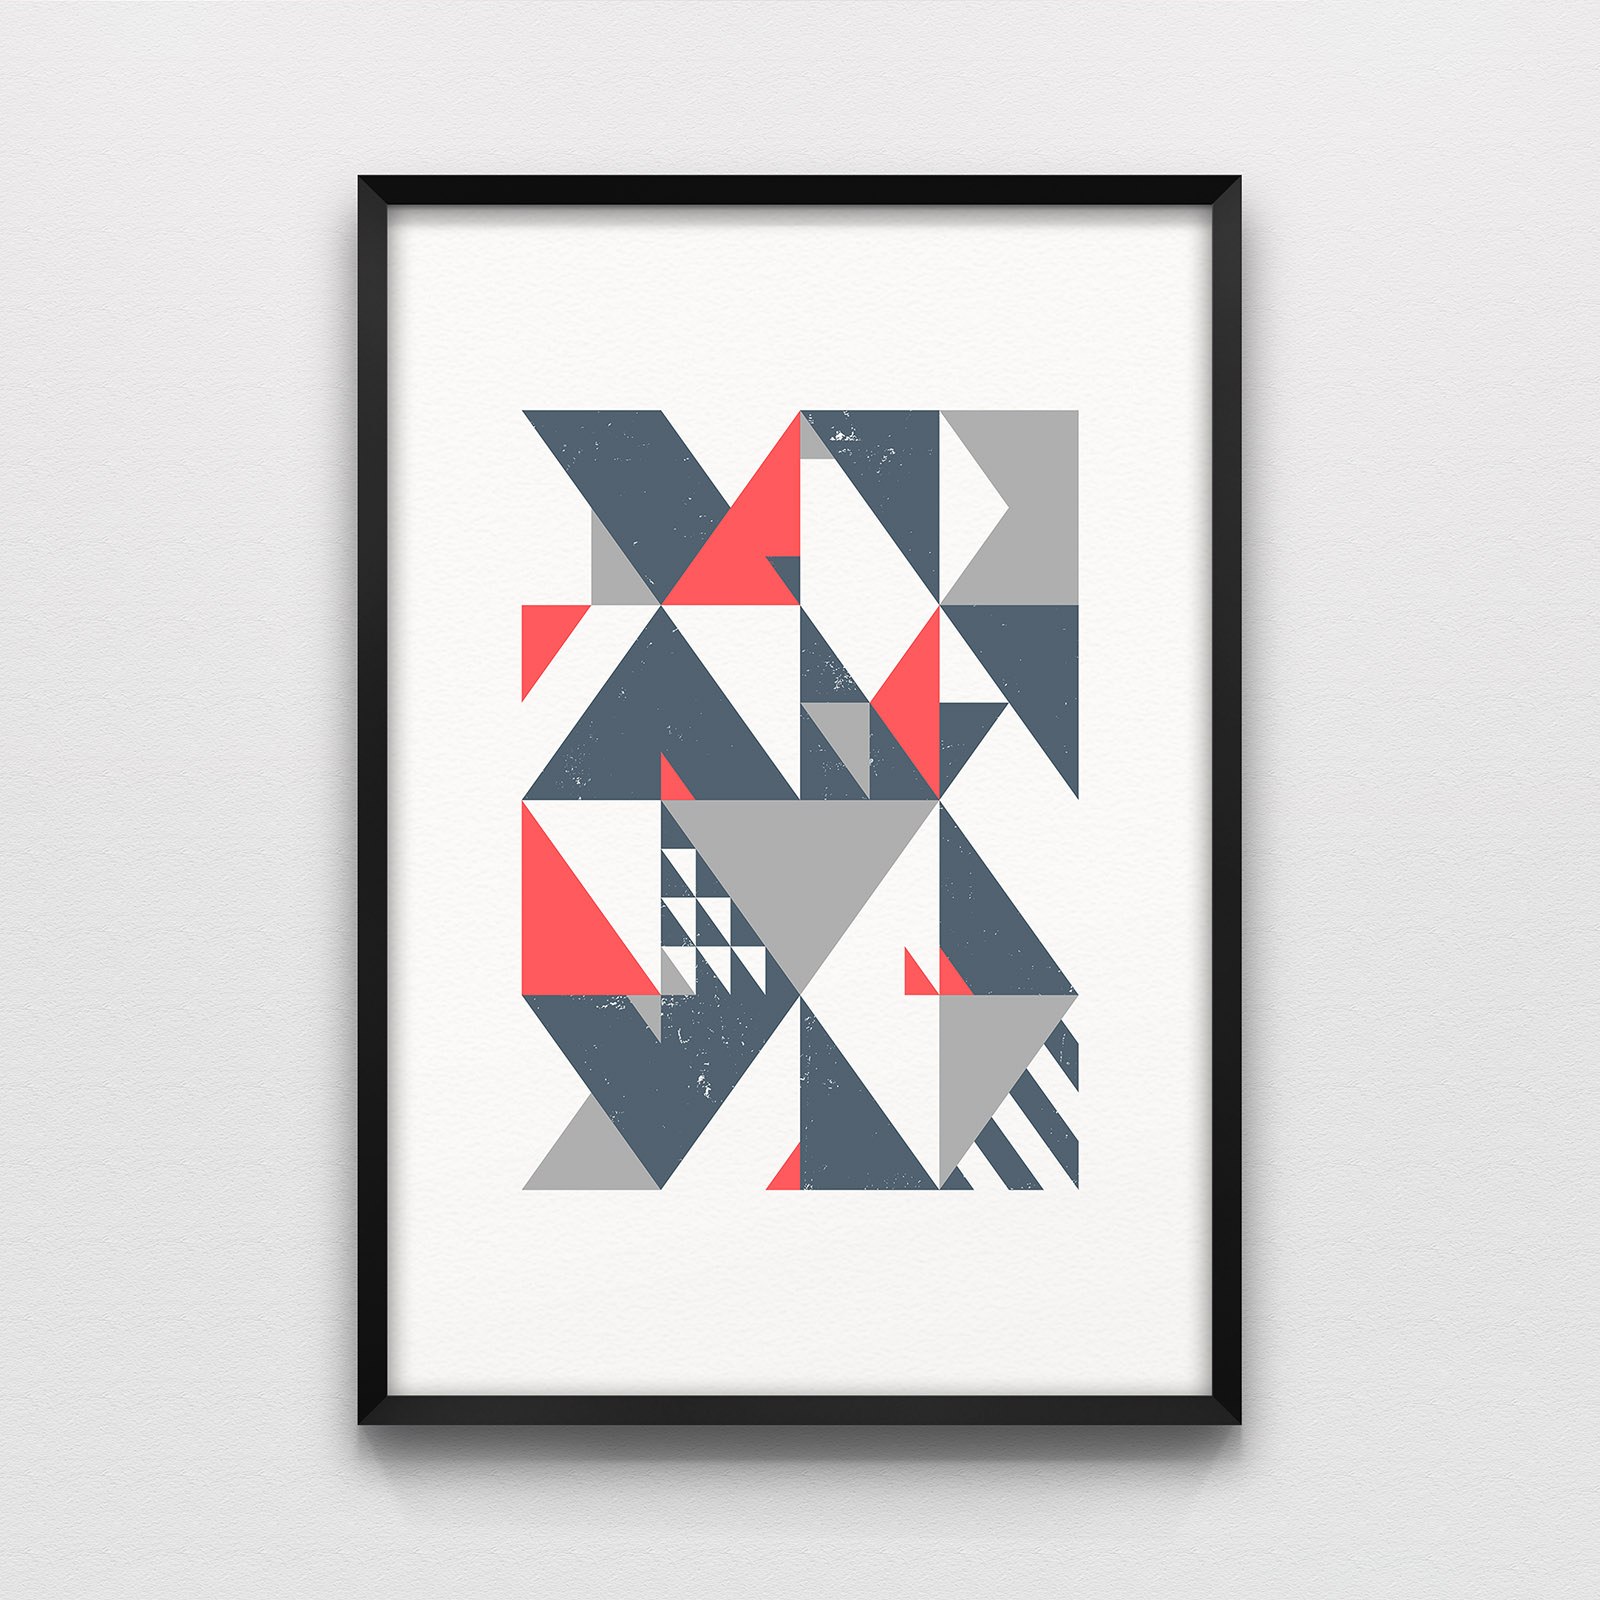 Algebra #2, 50 x 35 cm